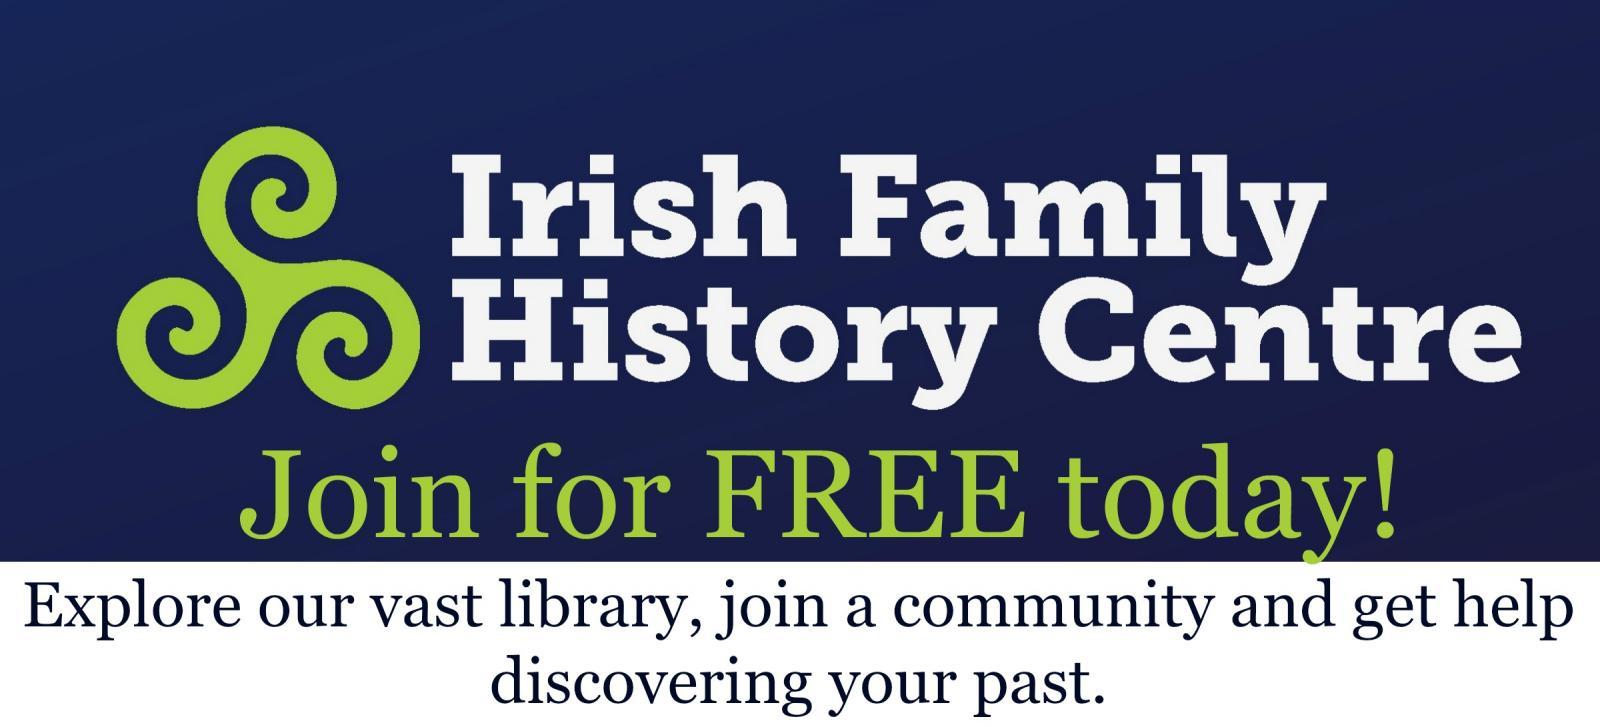 https://www.irishfamilyhistorycentre.com/membership